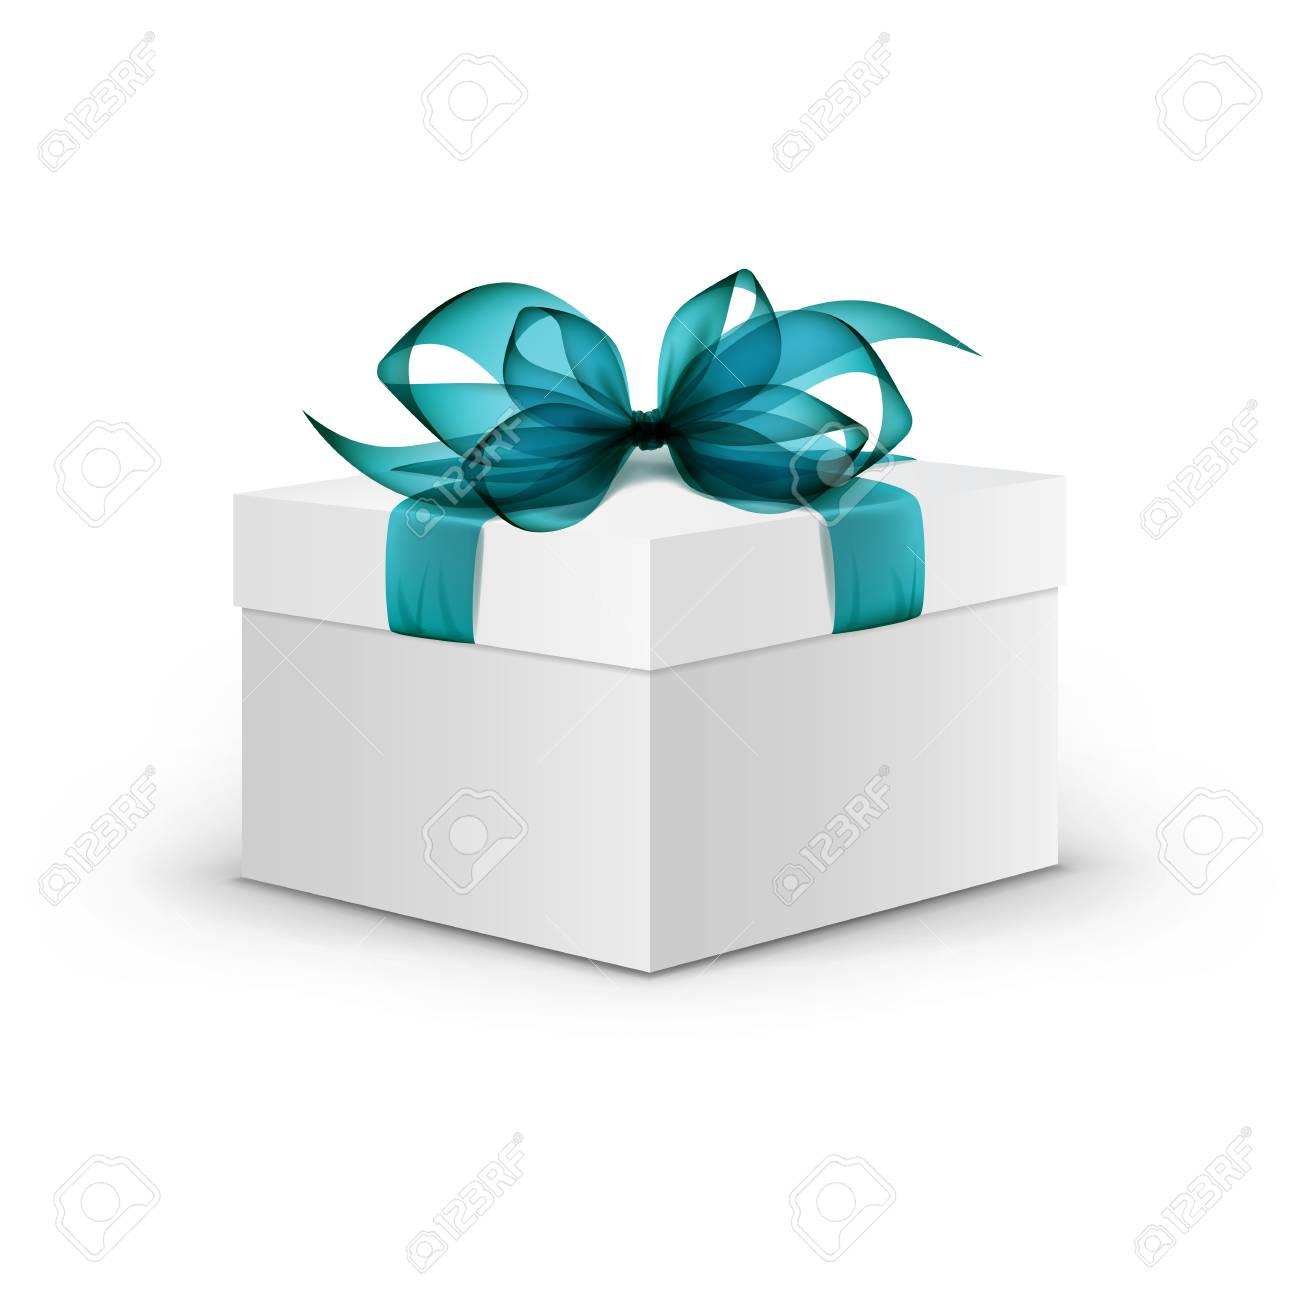 Gift Box Carr Blanc Avec Ruban Bleu Clair Clip Art Libres De Droits